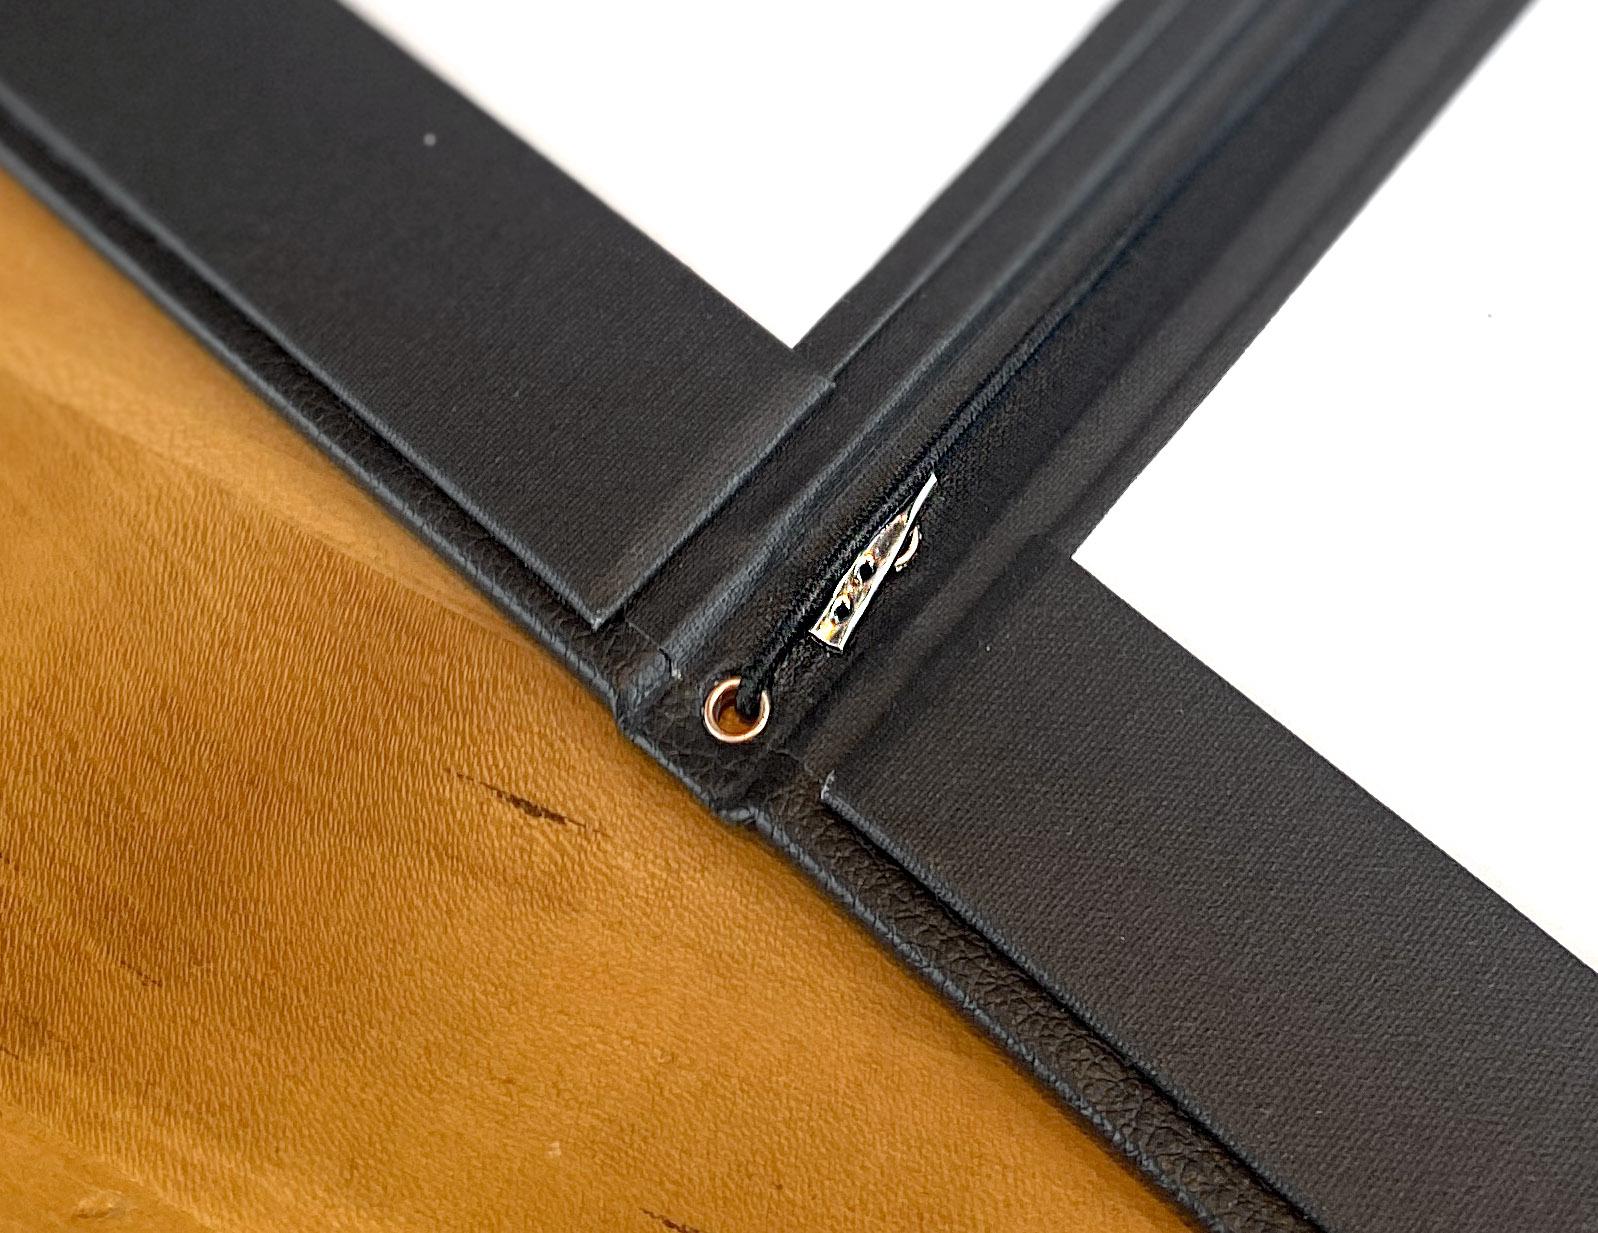 Elastic string page holder